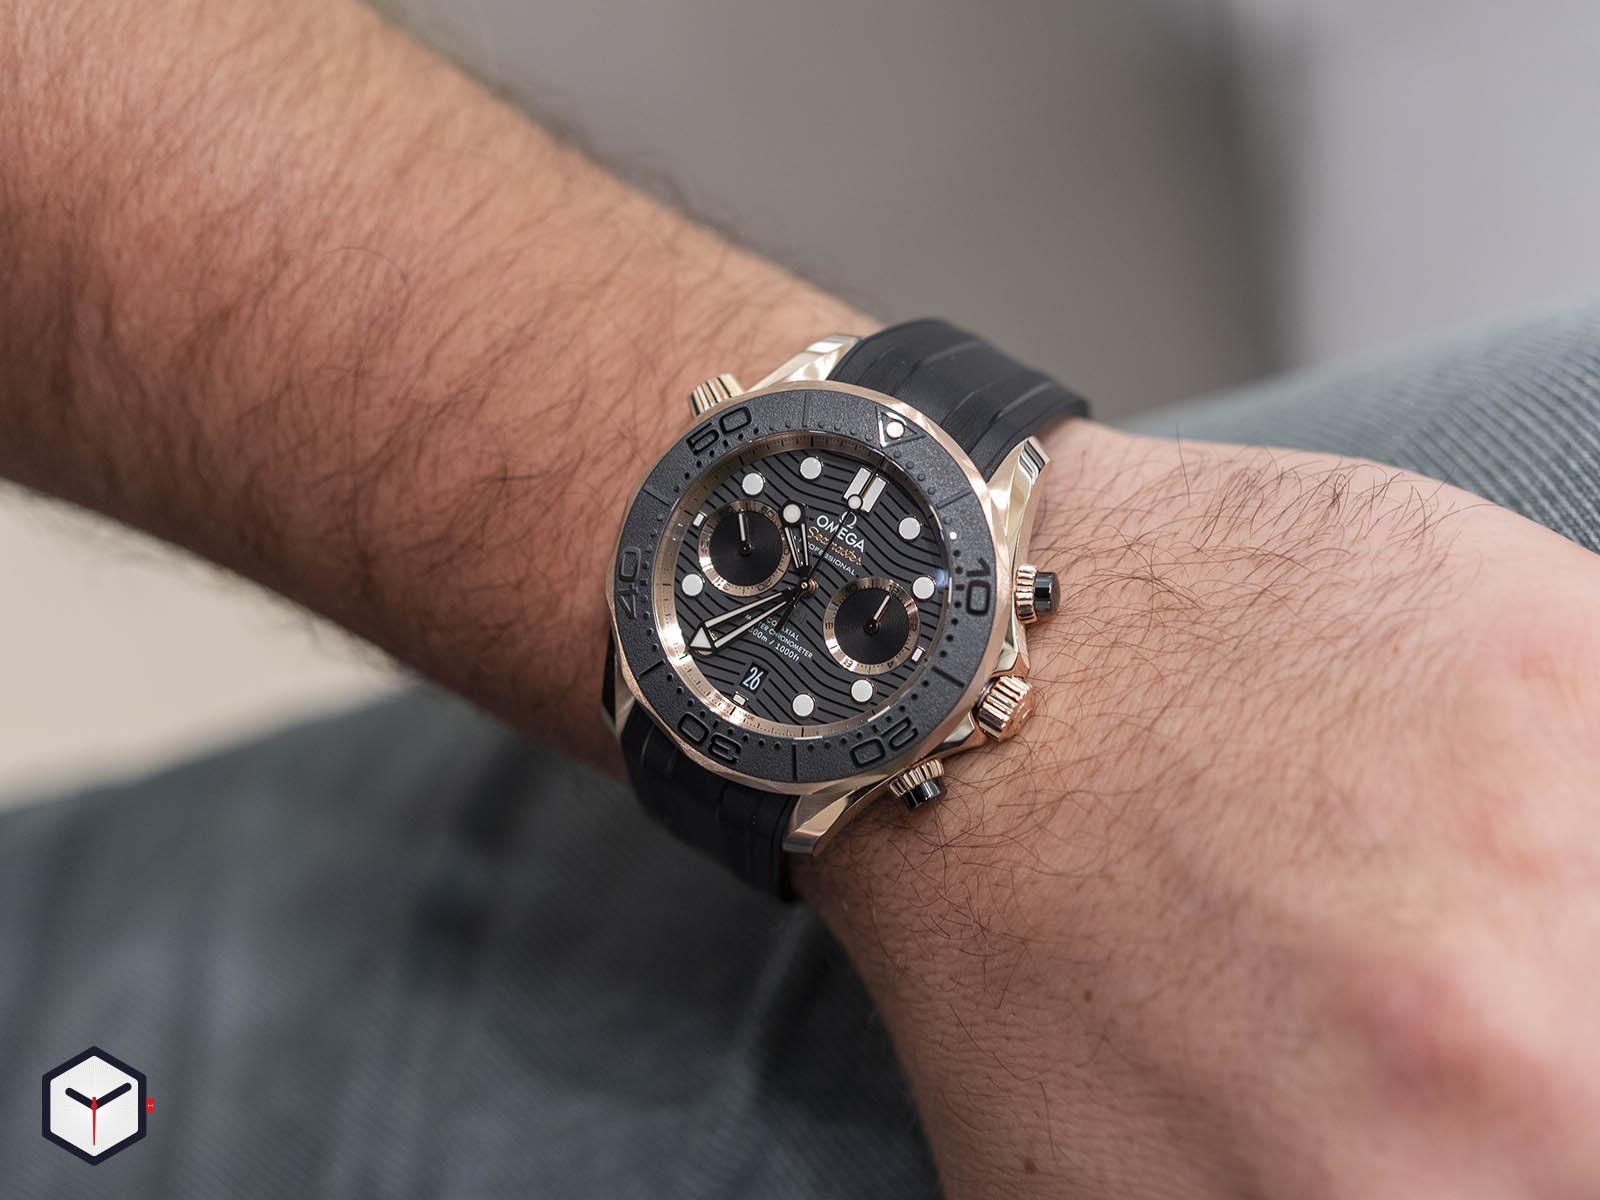 210-62-44-51-01-001-omega-seamaster-diver-300m-co-axial-master-chronometer-chronograph-7.jpg